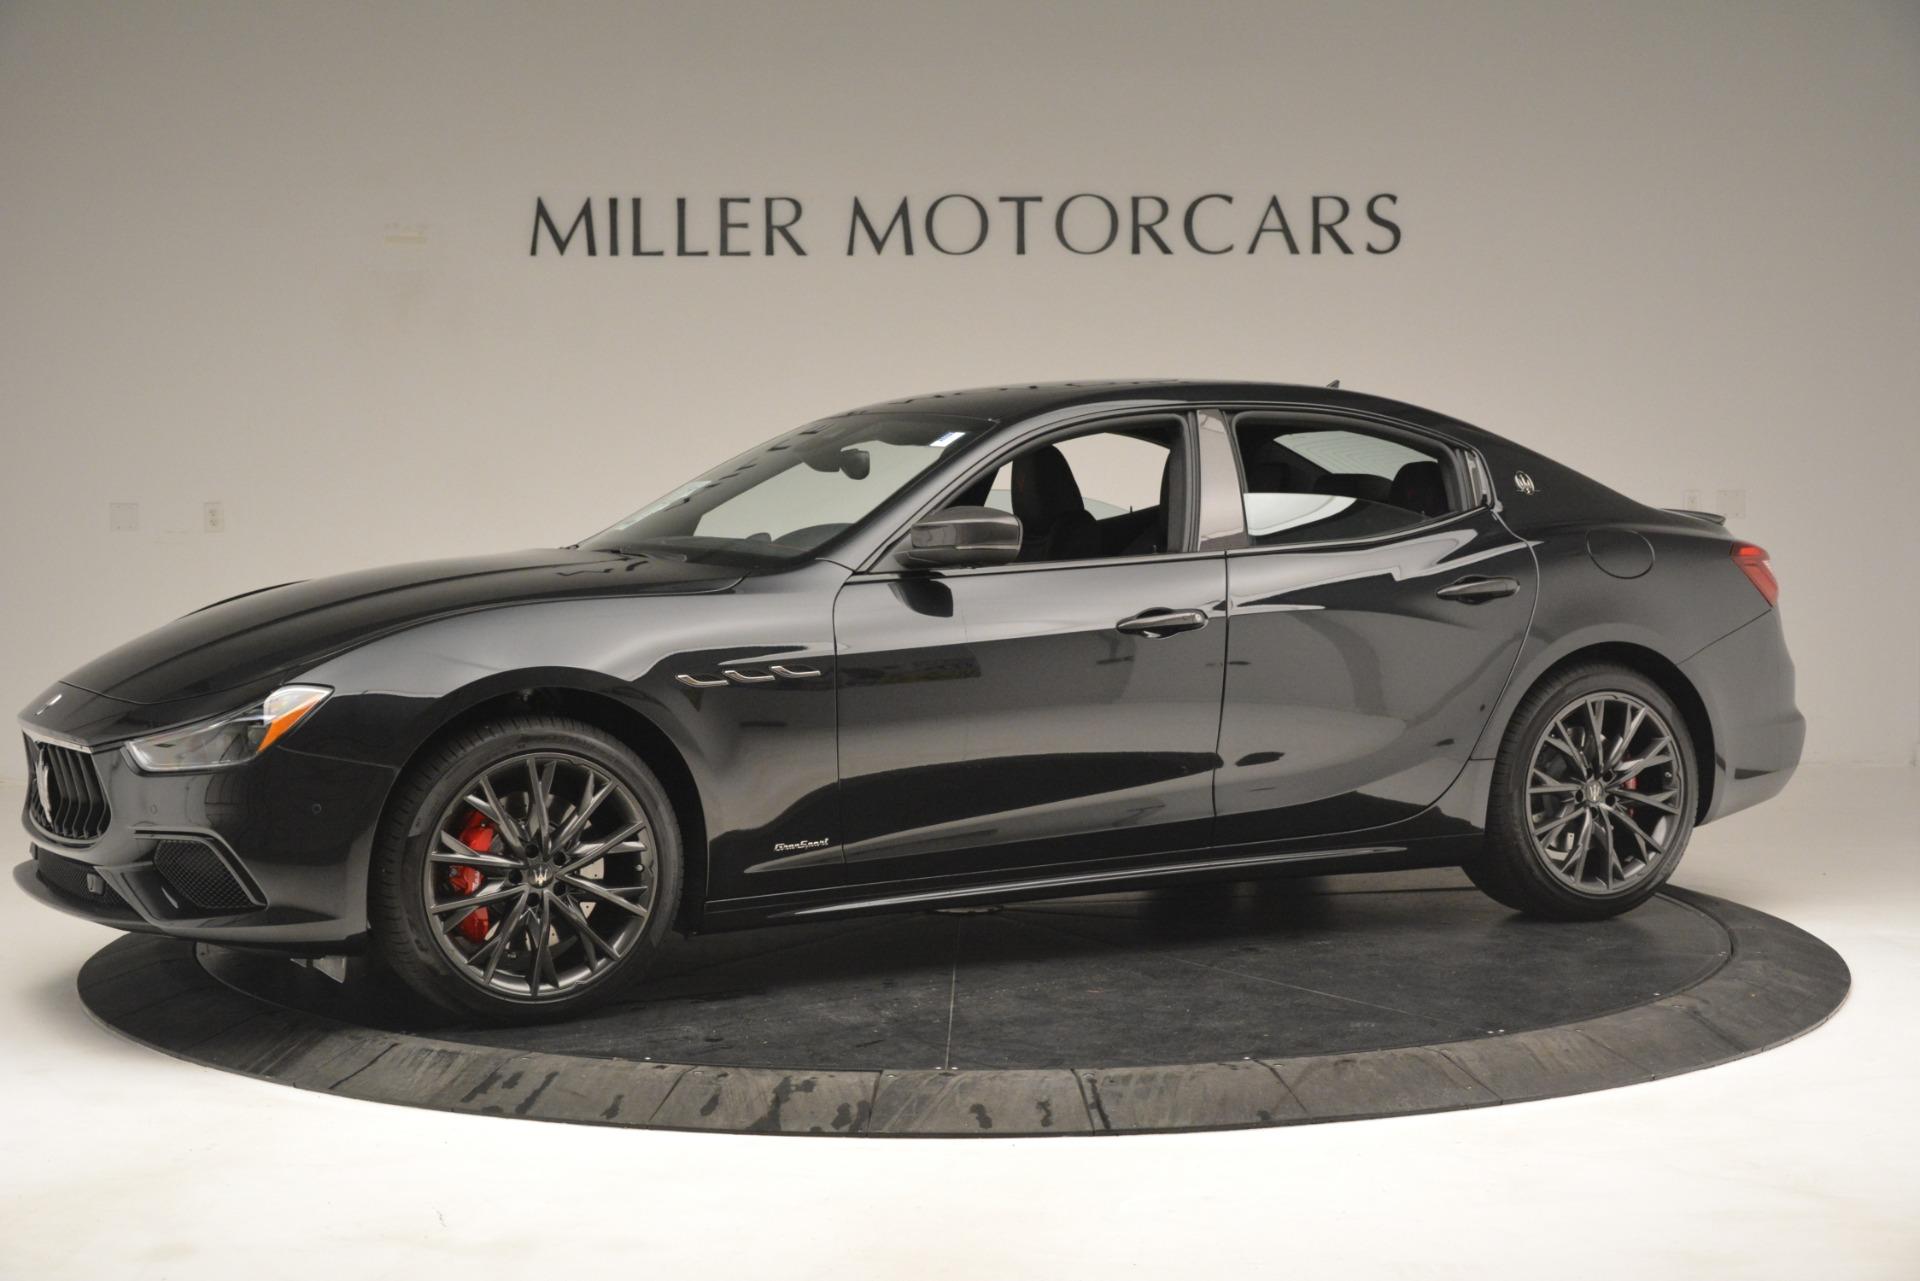 New 2019 Maserati Ghibli S Q4 GranSport For Sale In Greenwich, CT 2926_p2